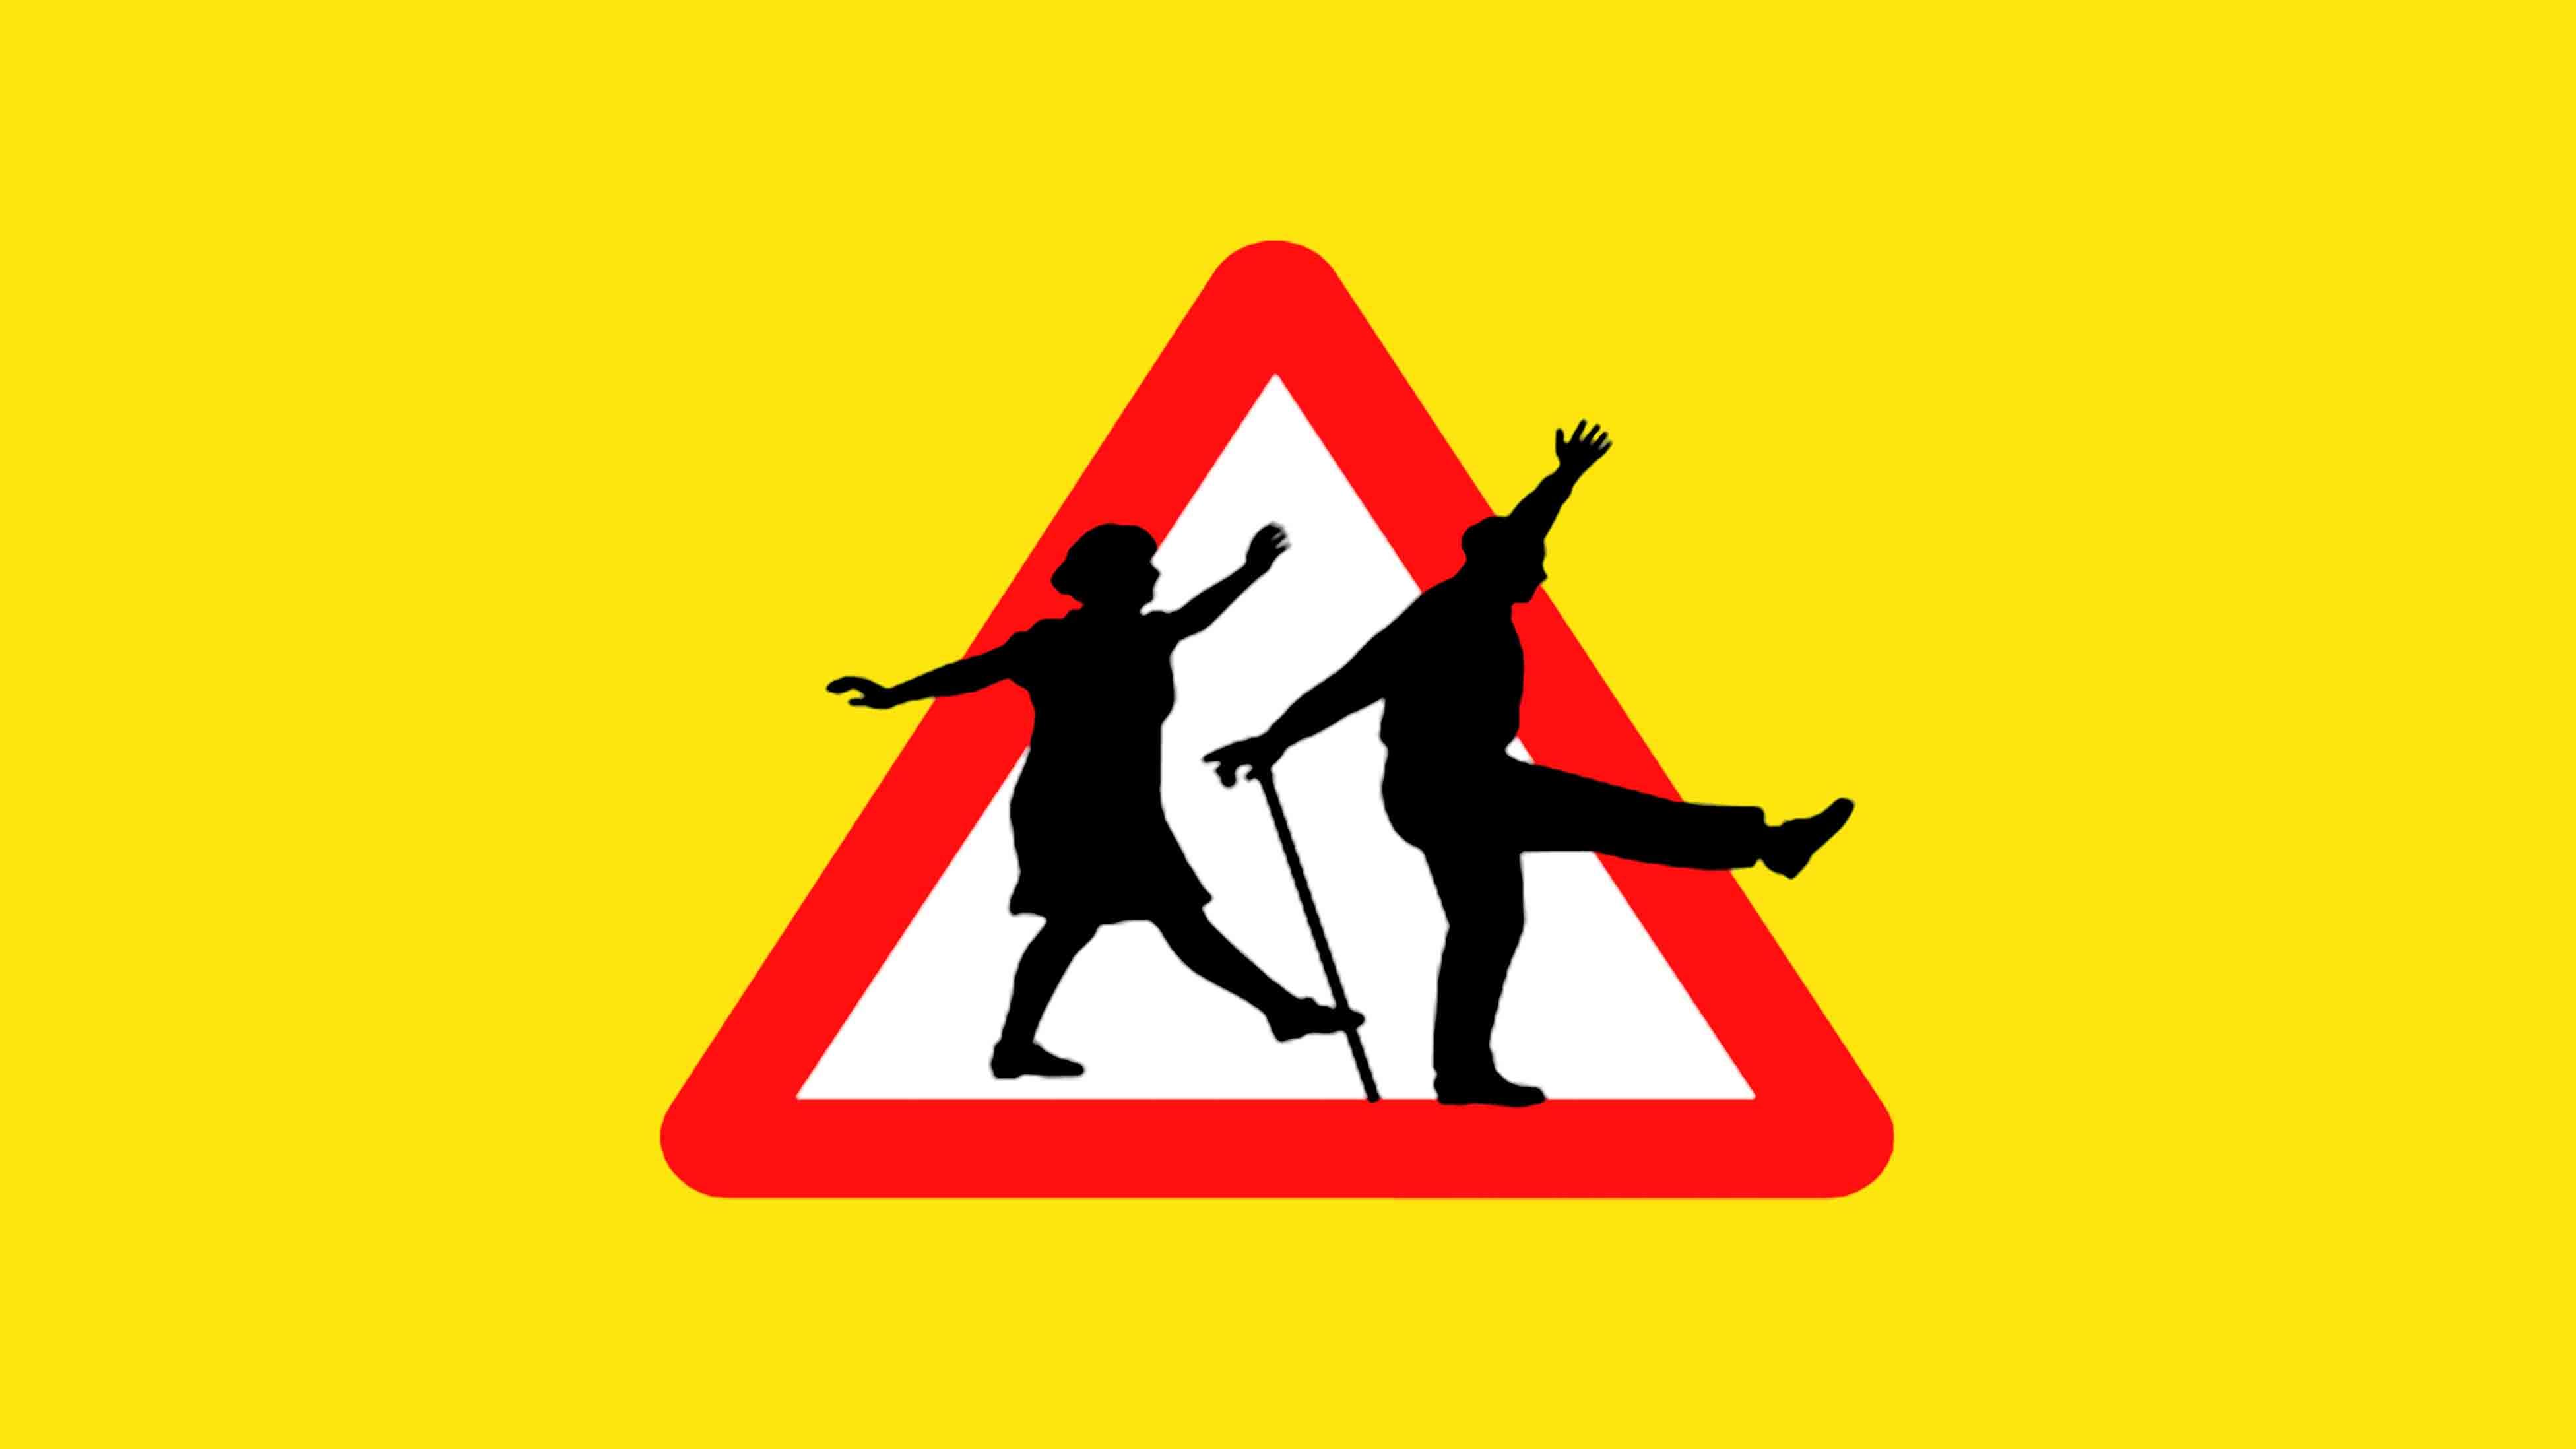 Alternative elderly road sign